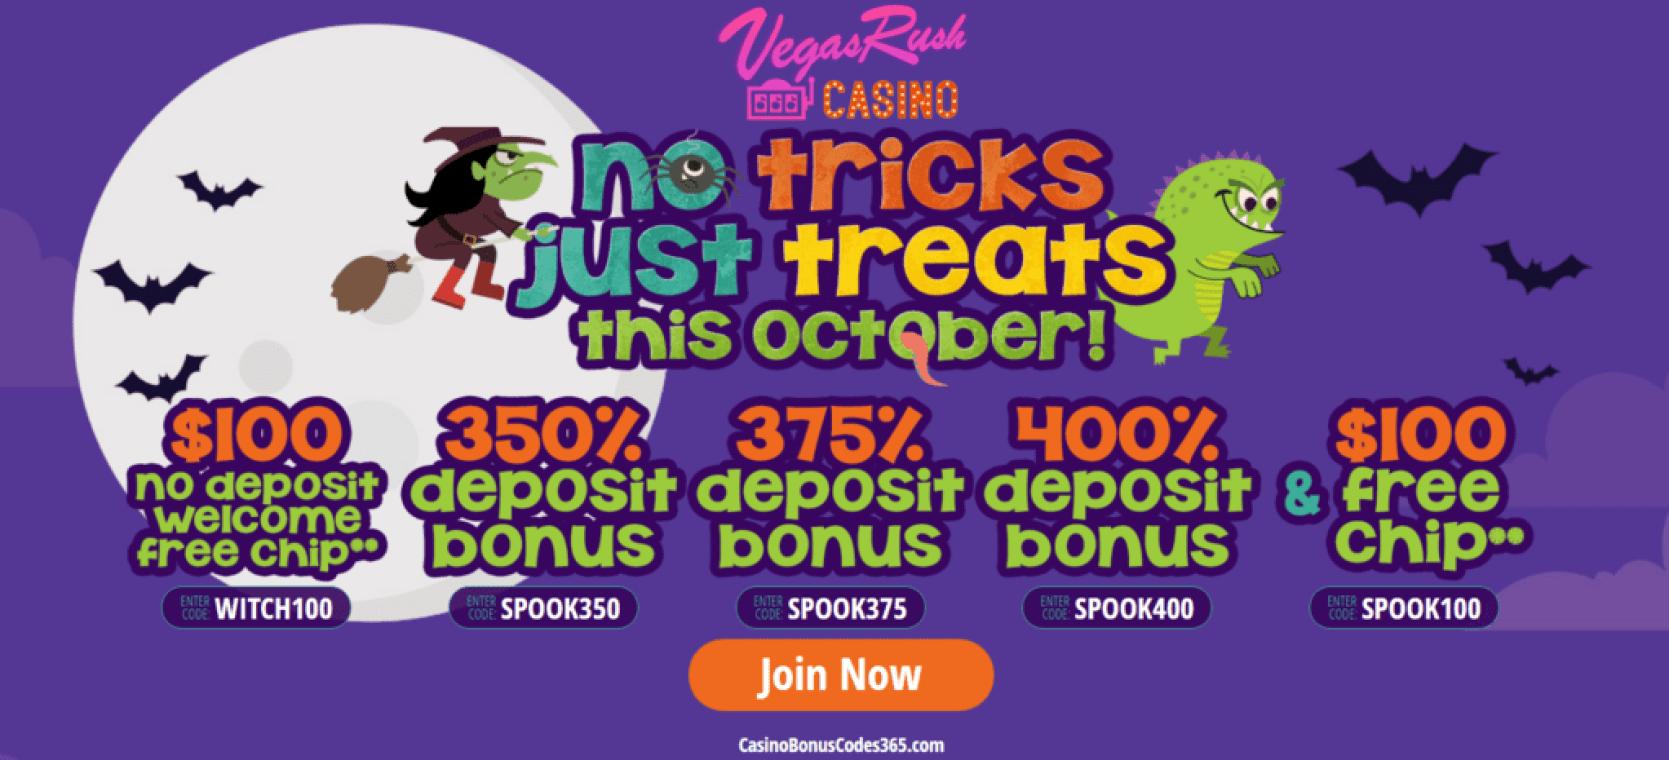 no deposit bonus vegas rush casino